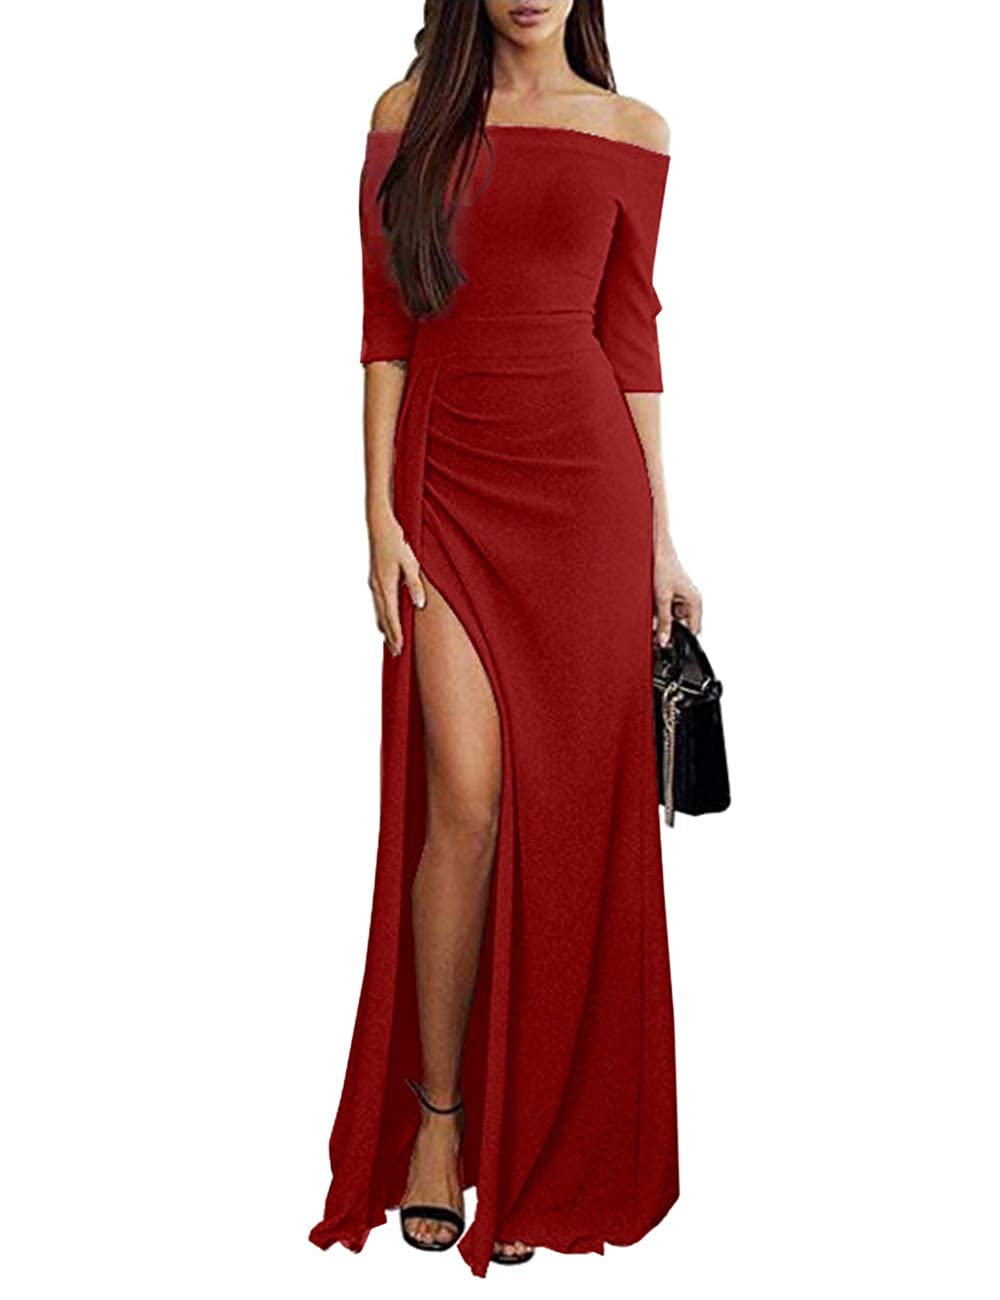 SEBOWEL Women Elegant Off Shoulder Evening Gown Slim Split Party Long Maxi Dress